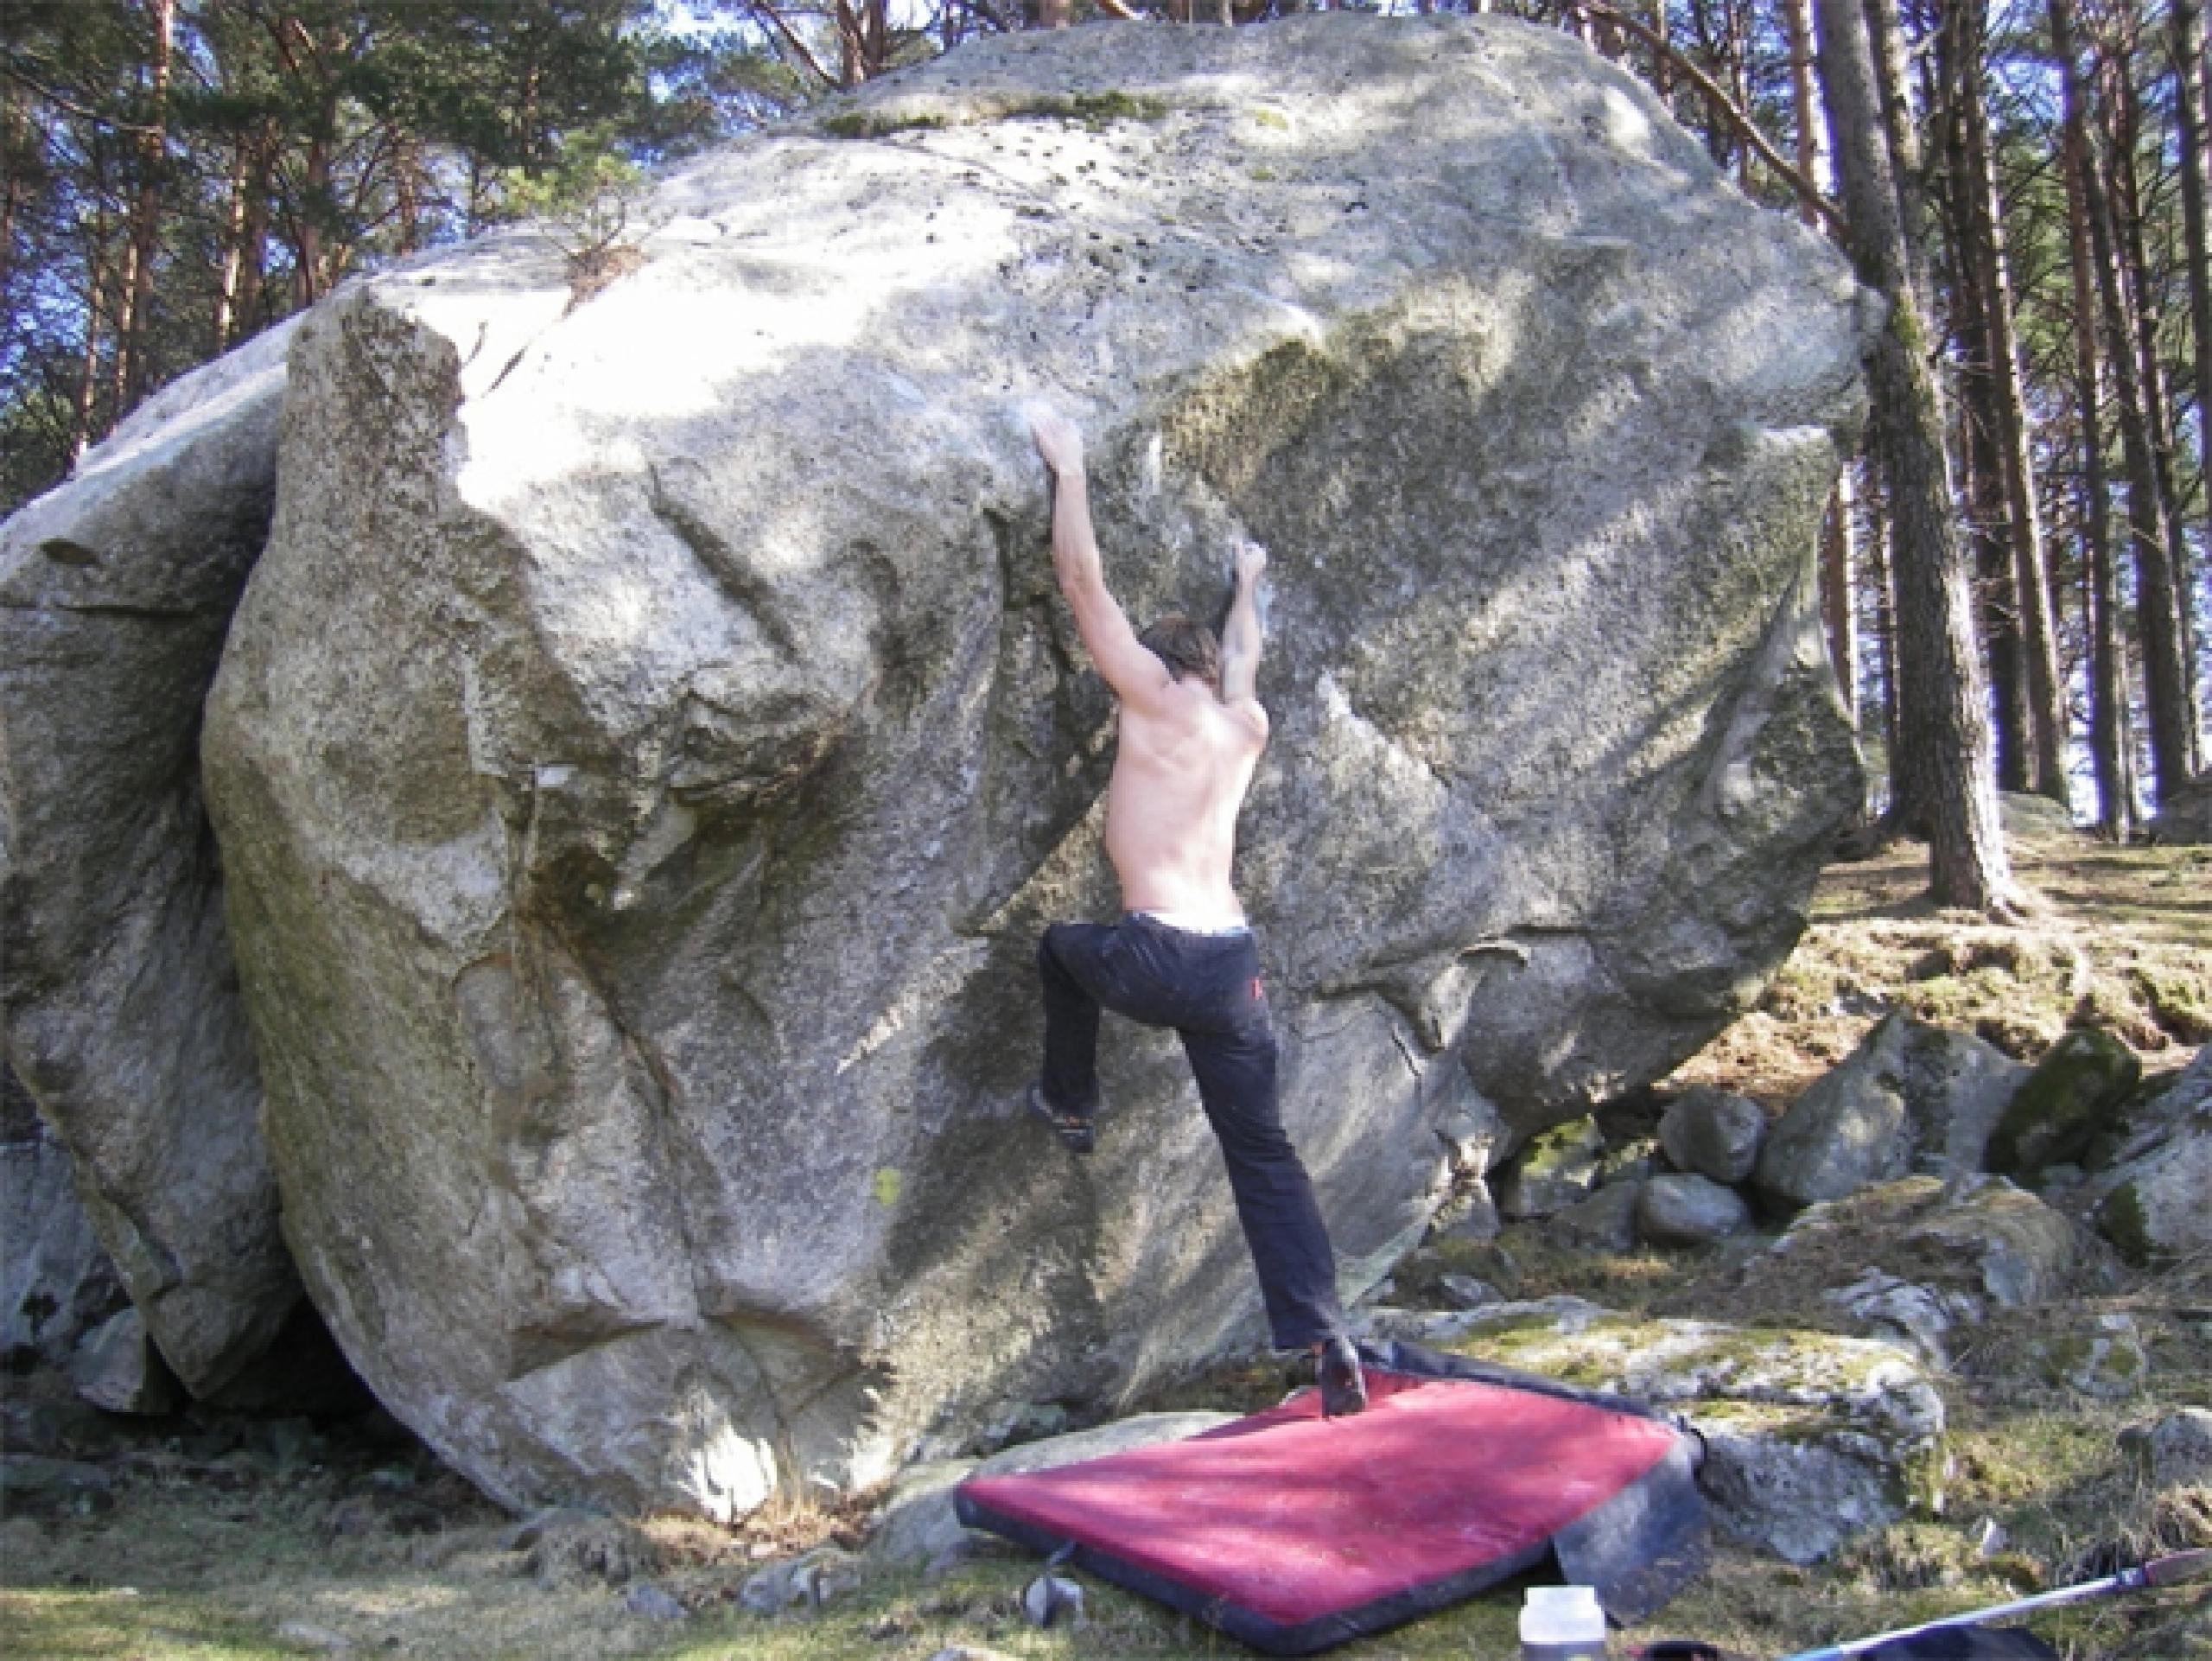 photographer: Kaja Raa Storaker, in photo: Jan Eivind Danielsen